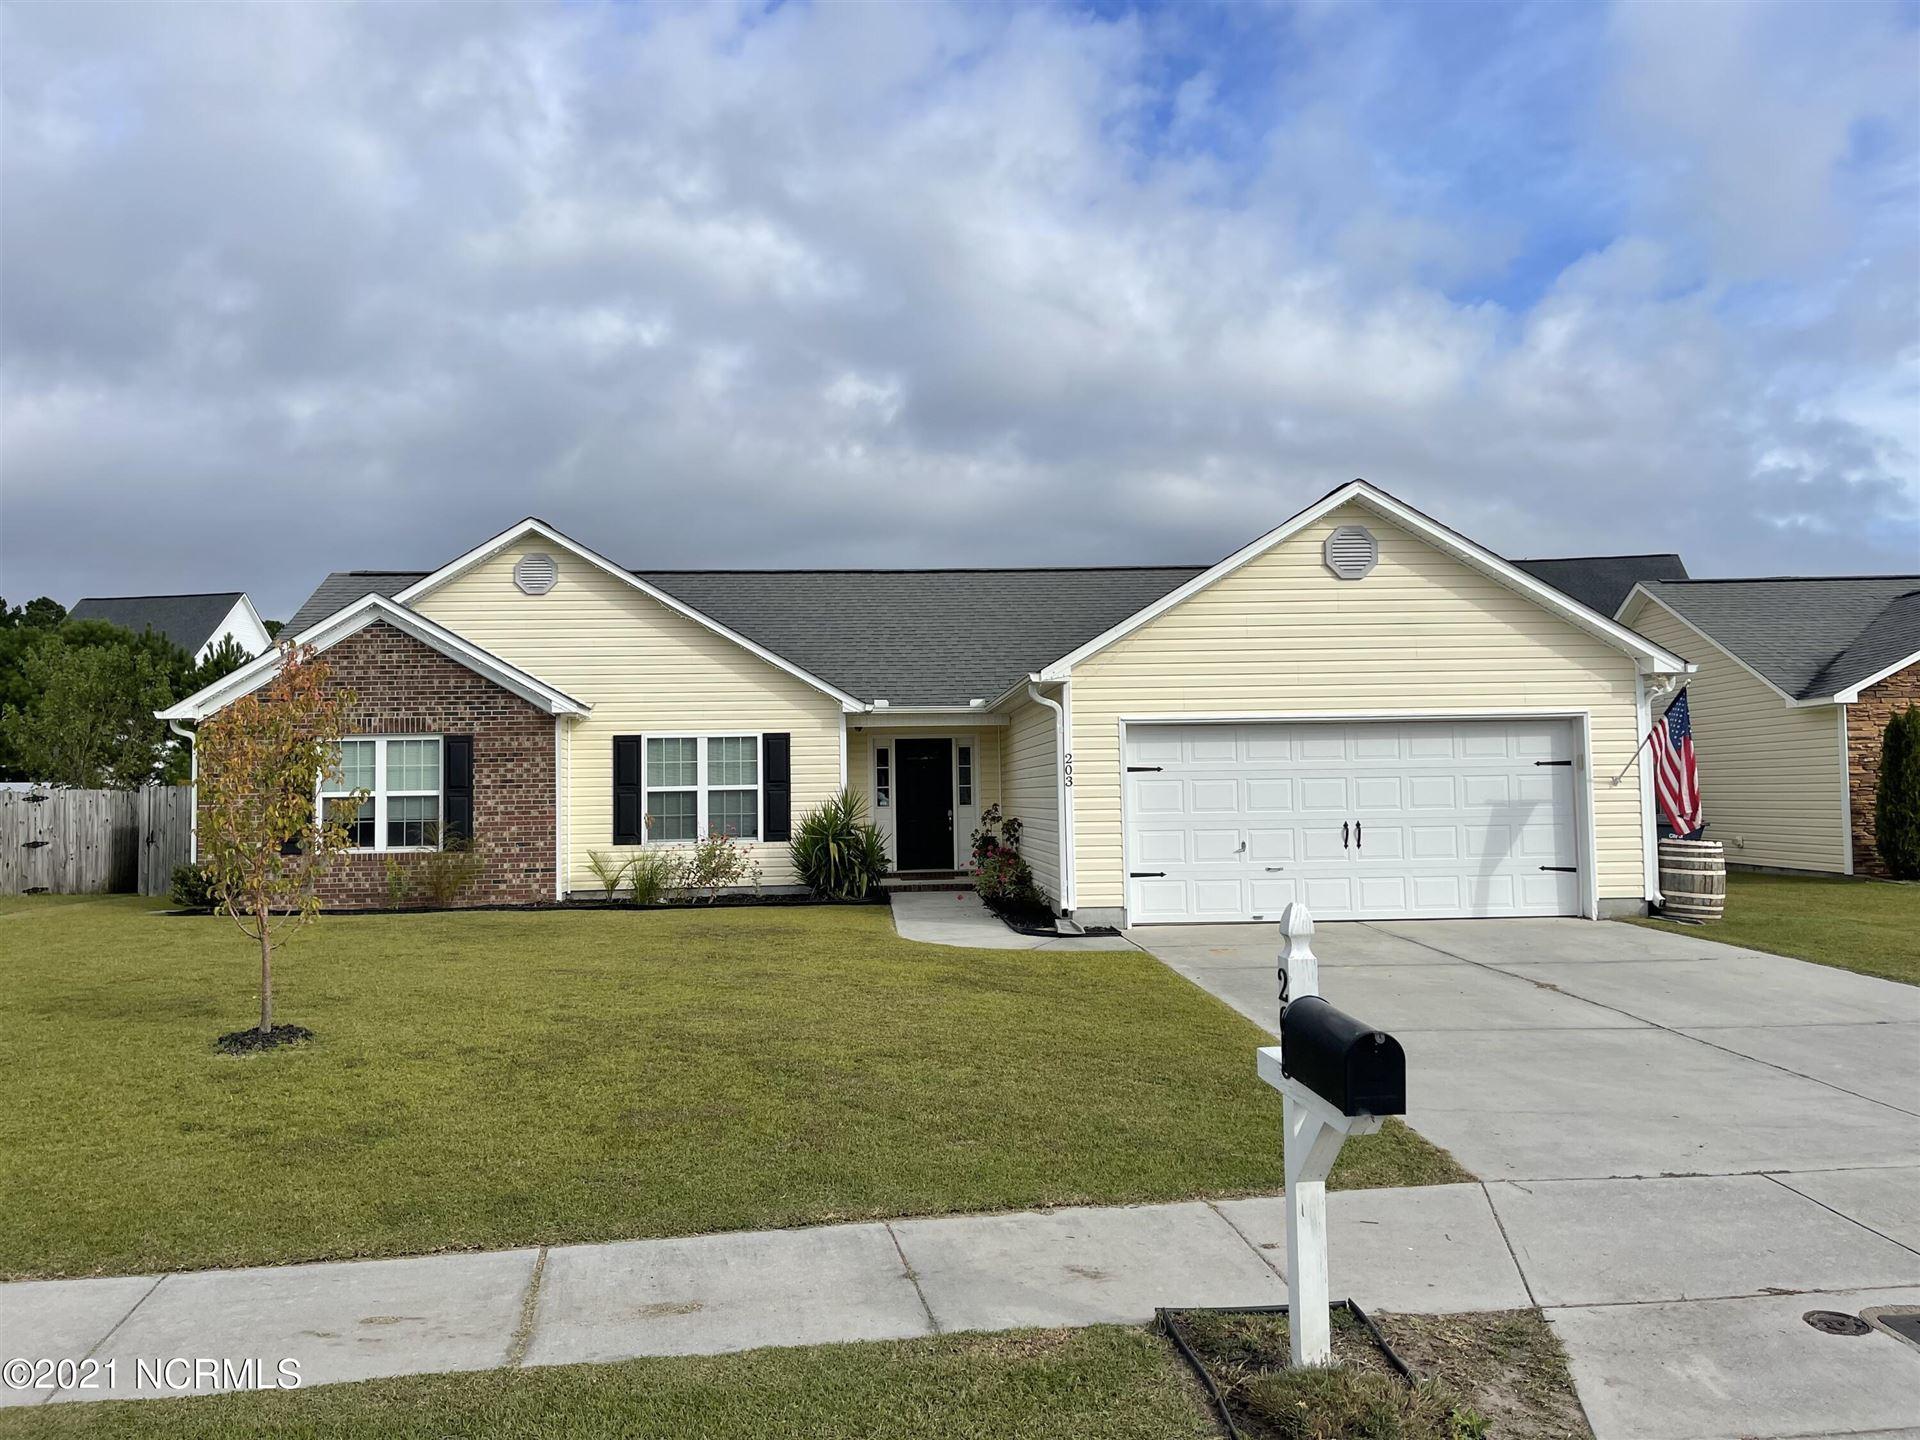 Photo of 203 Wynbrookee Lane, Jacksonville, NC 28546 (MLS # 100293369)